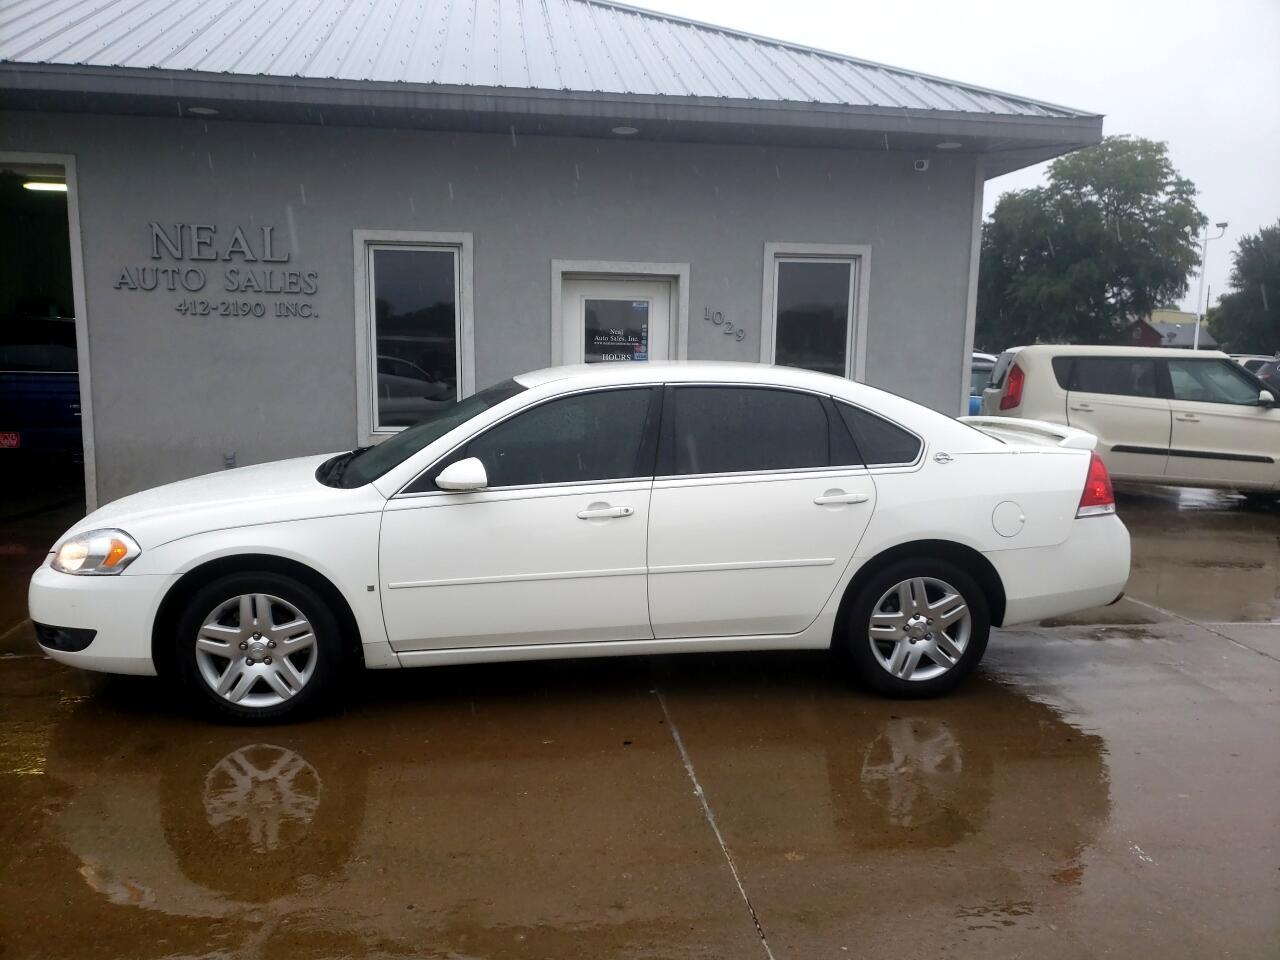 2008 Chevrolet Impala LT2 3.9L